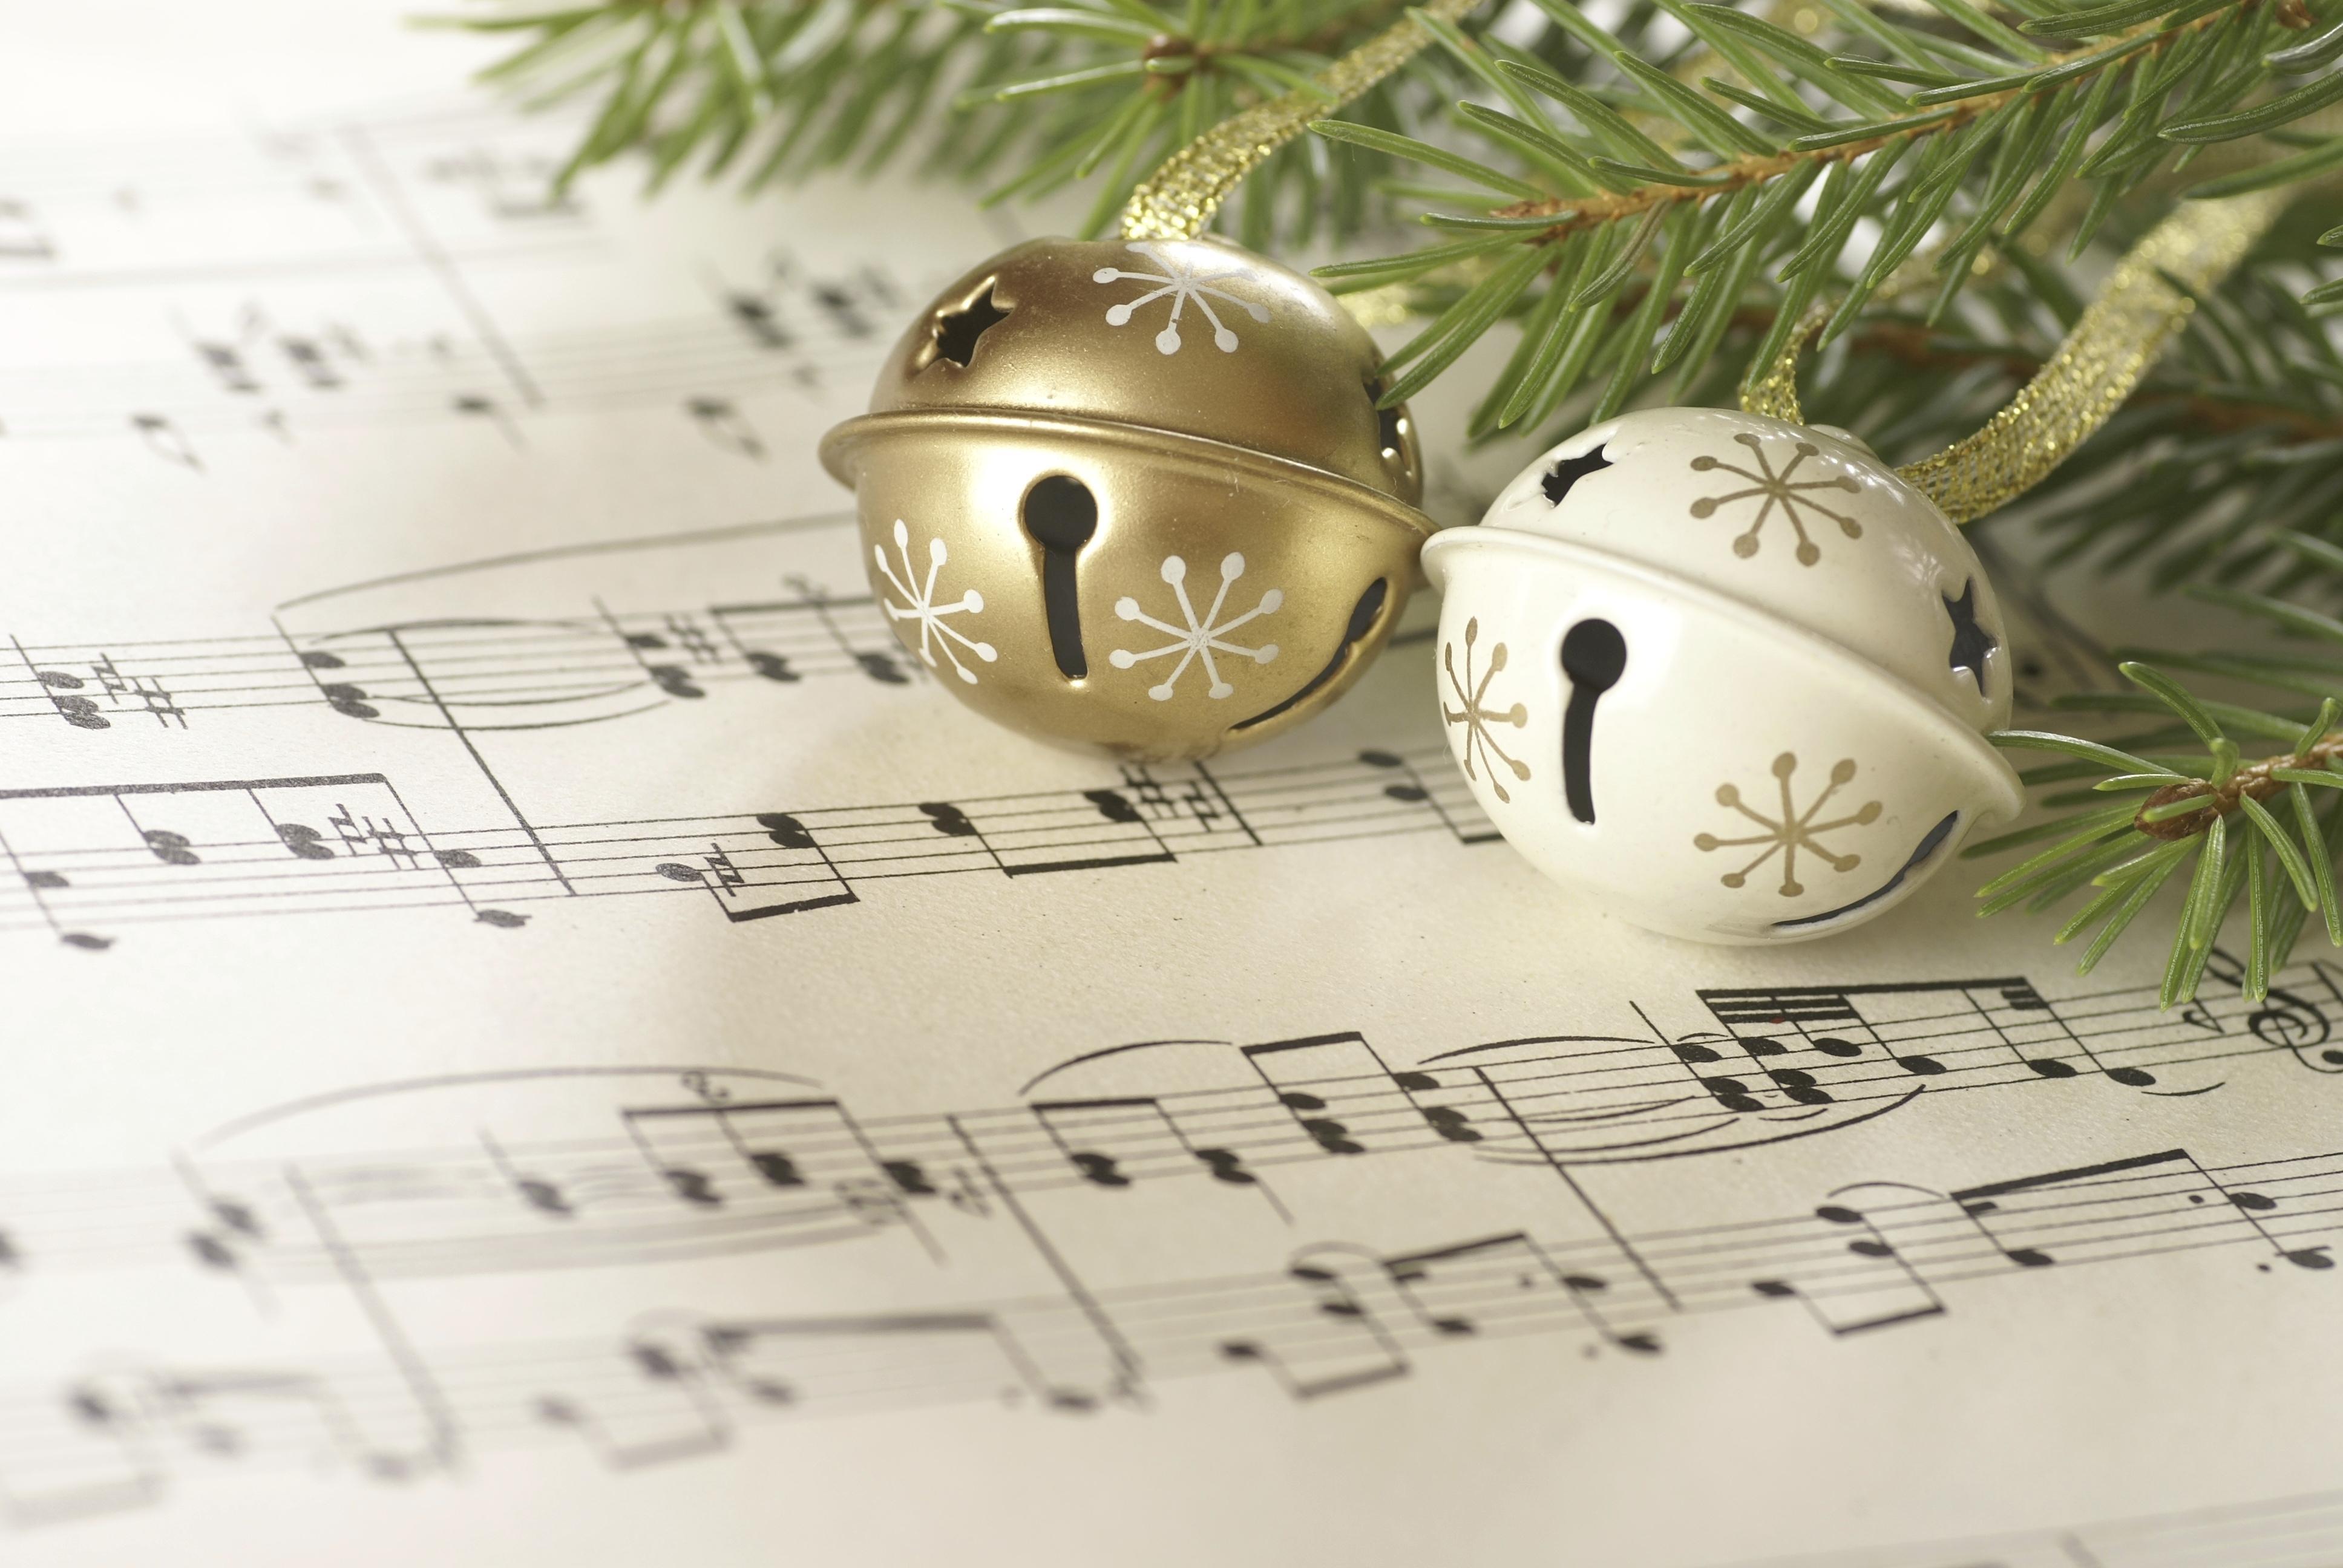 song_for_christmas_golden_music_notes_hd-wallpaper-1583674.jpg